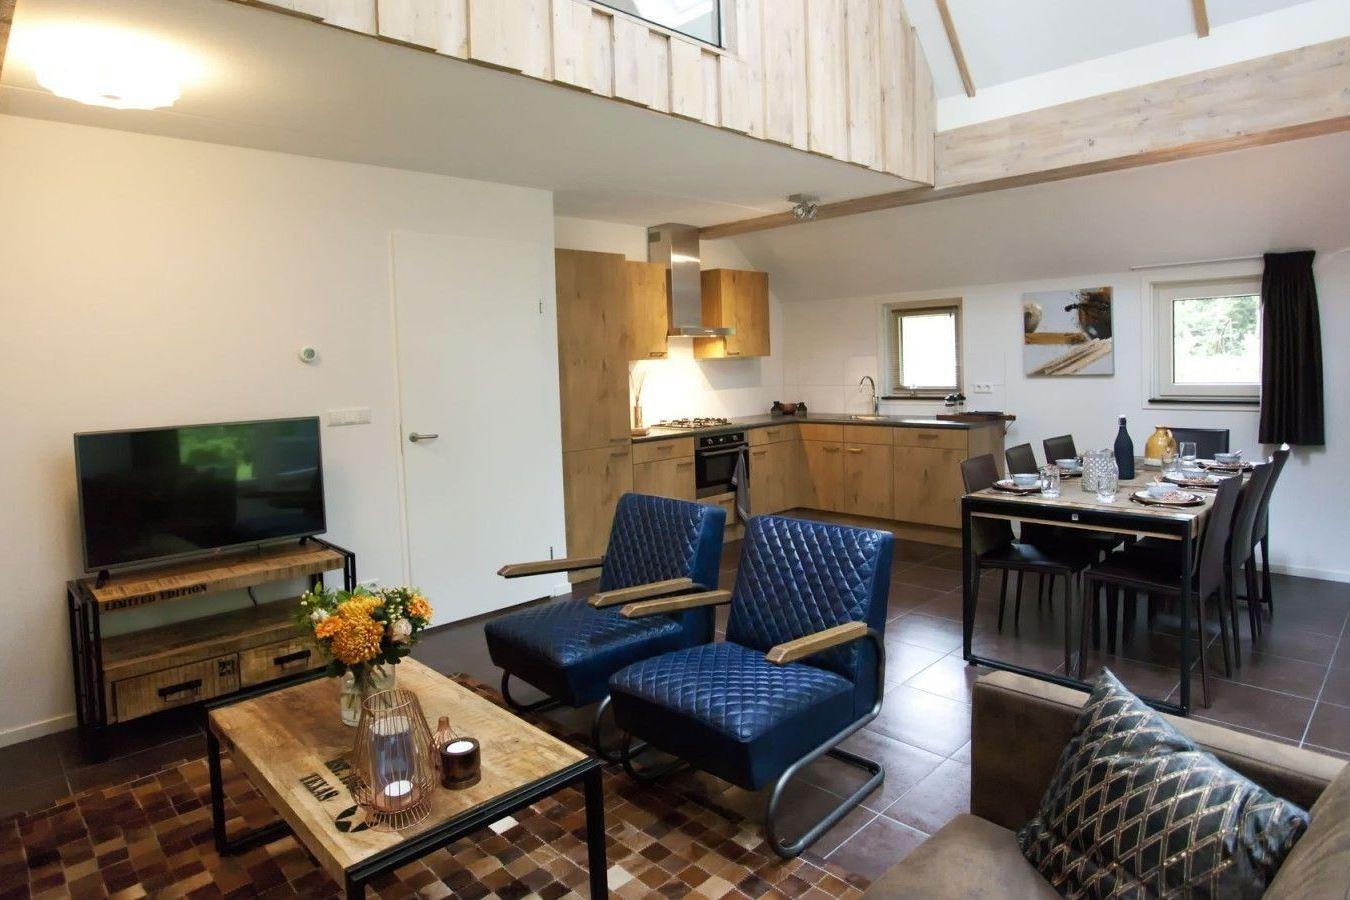 Bekijk foto 3 van Villa Avantage Nouveau